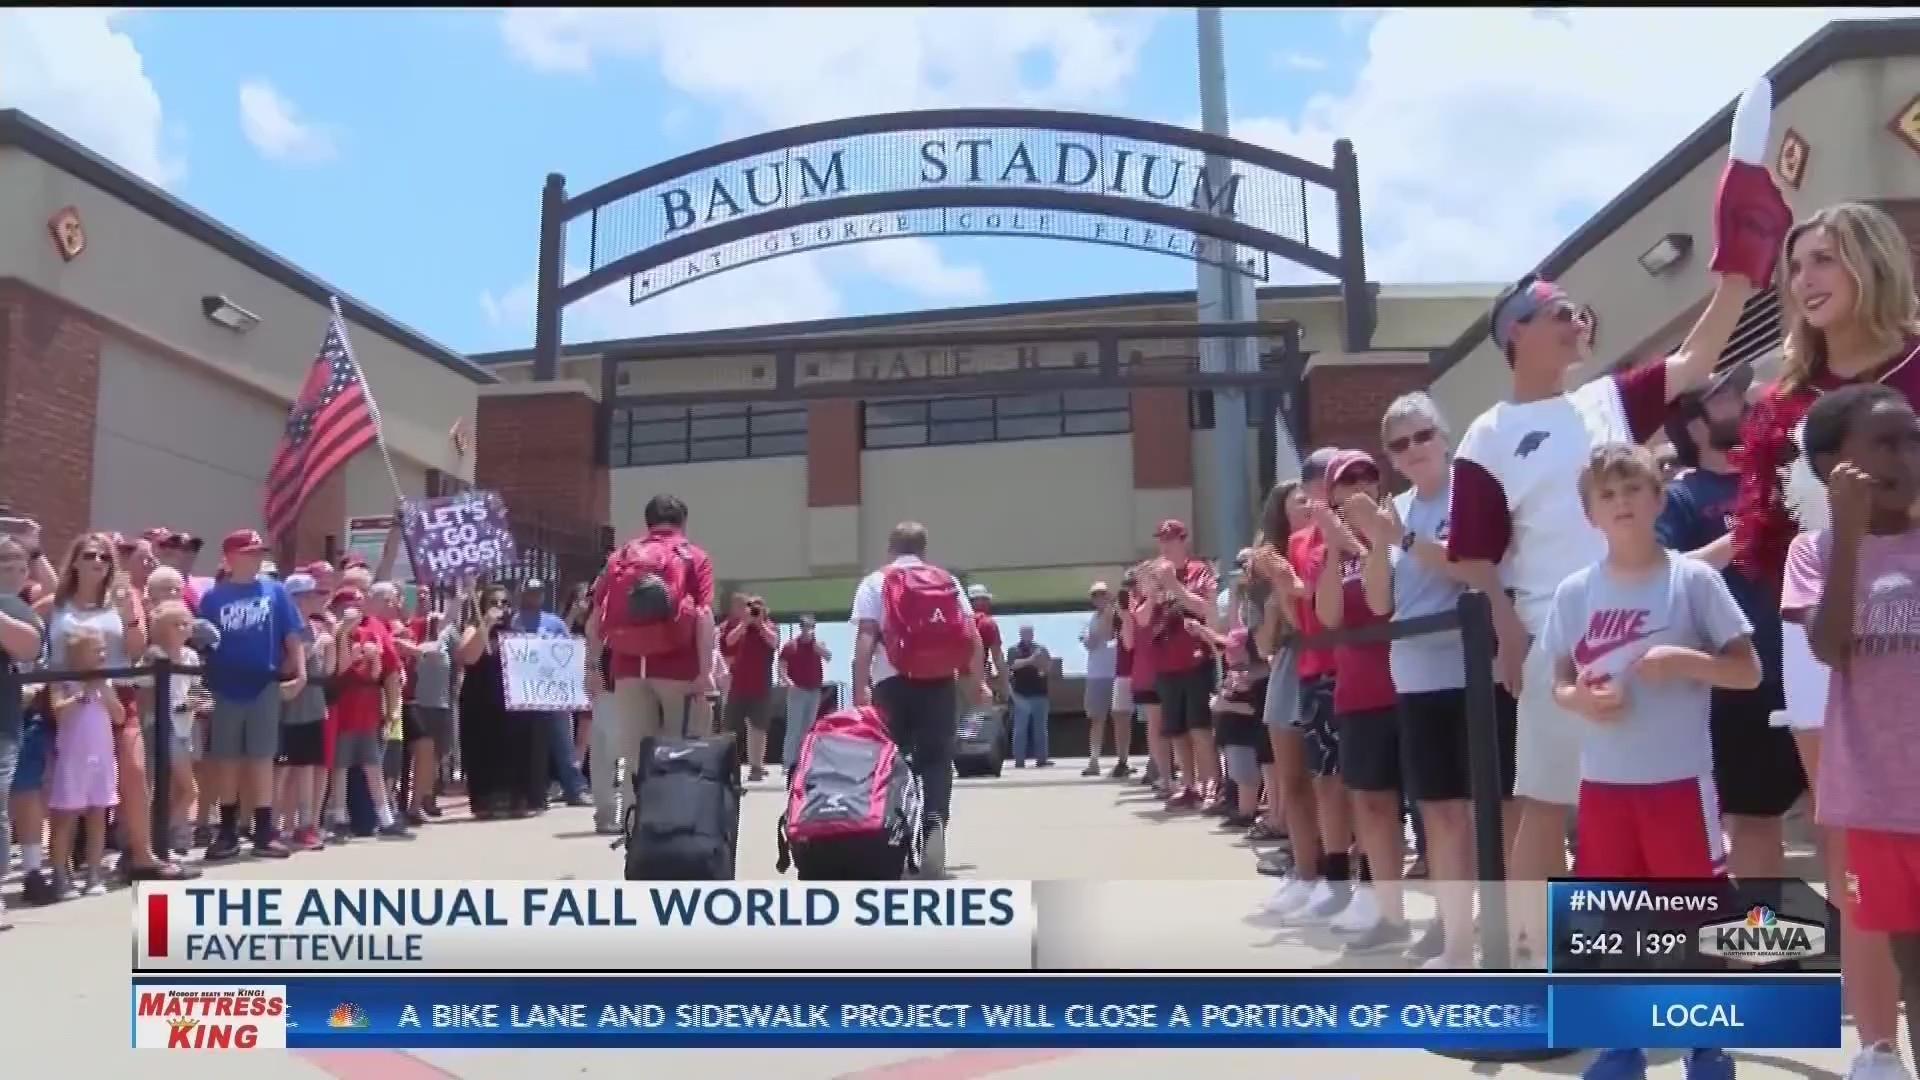 UA_Baseball_Fall_World_Series_Begins_0_20181015130357